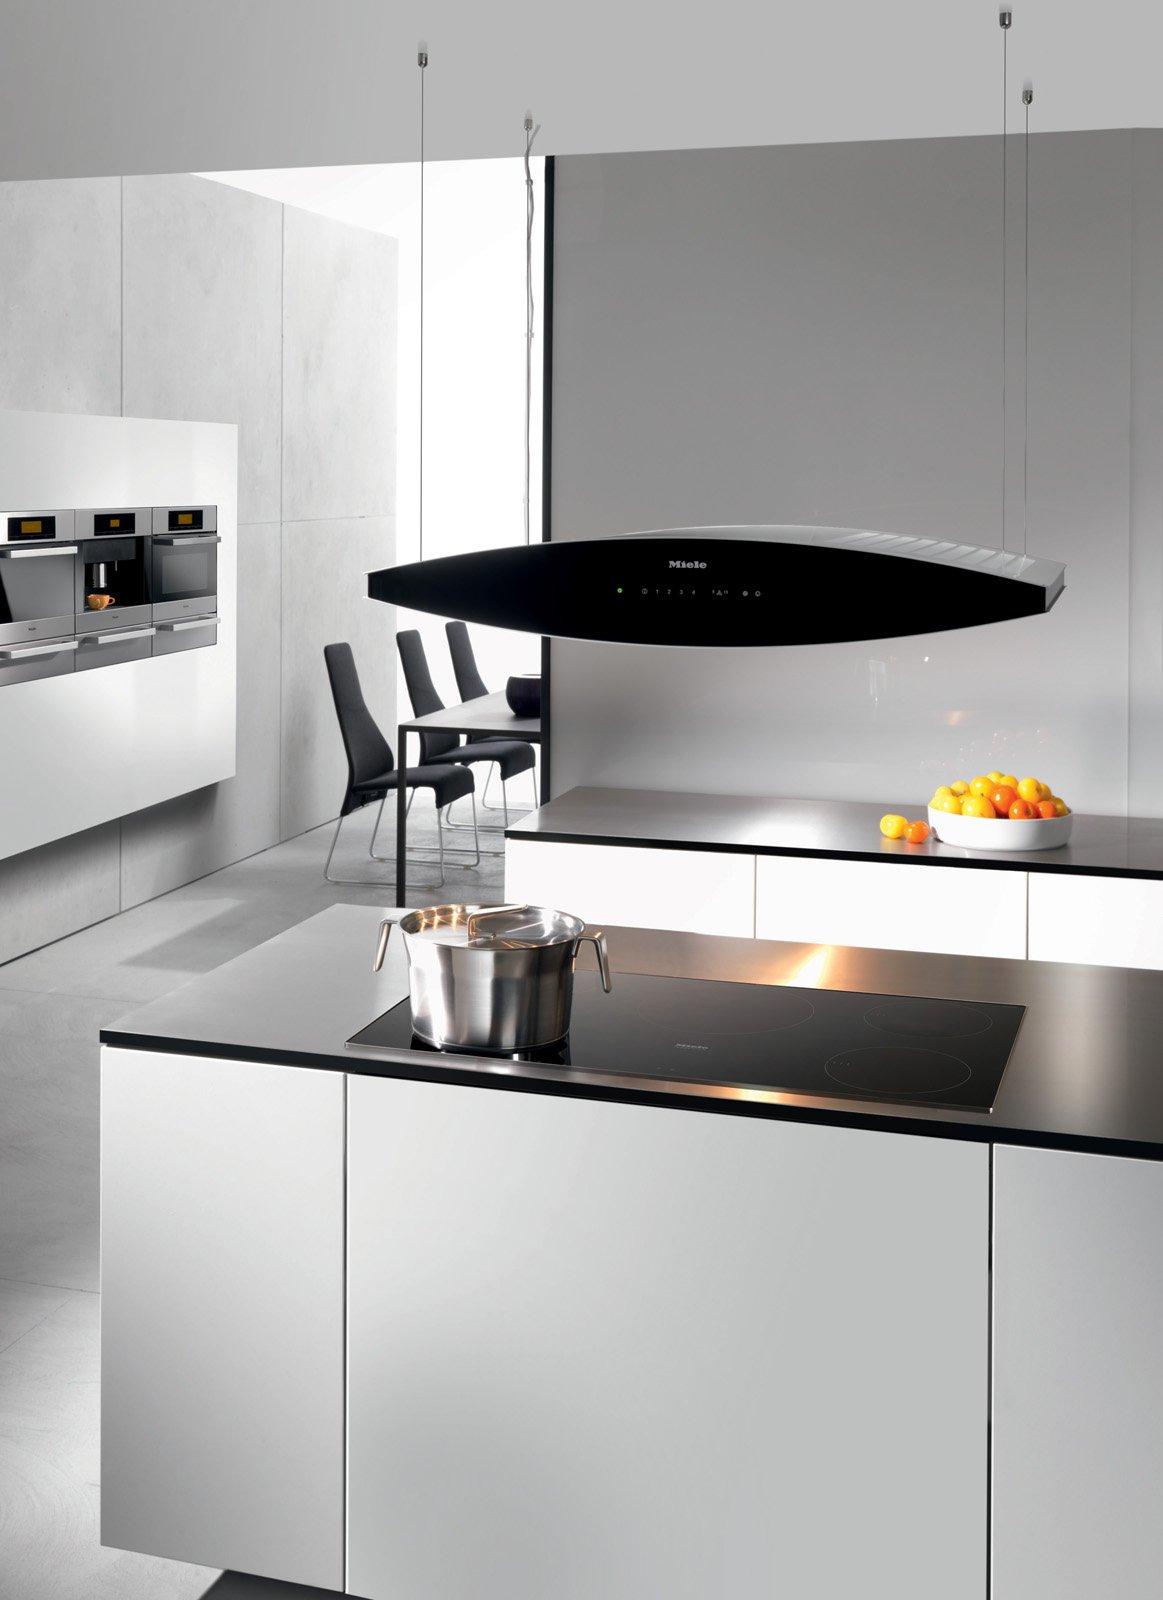 Cappe per la cucina cose di casa - Cappe per isola cucina ...